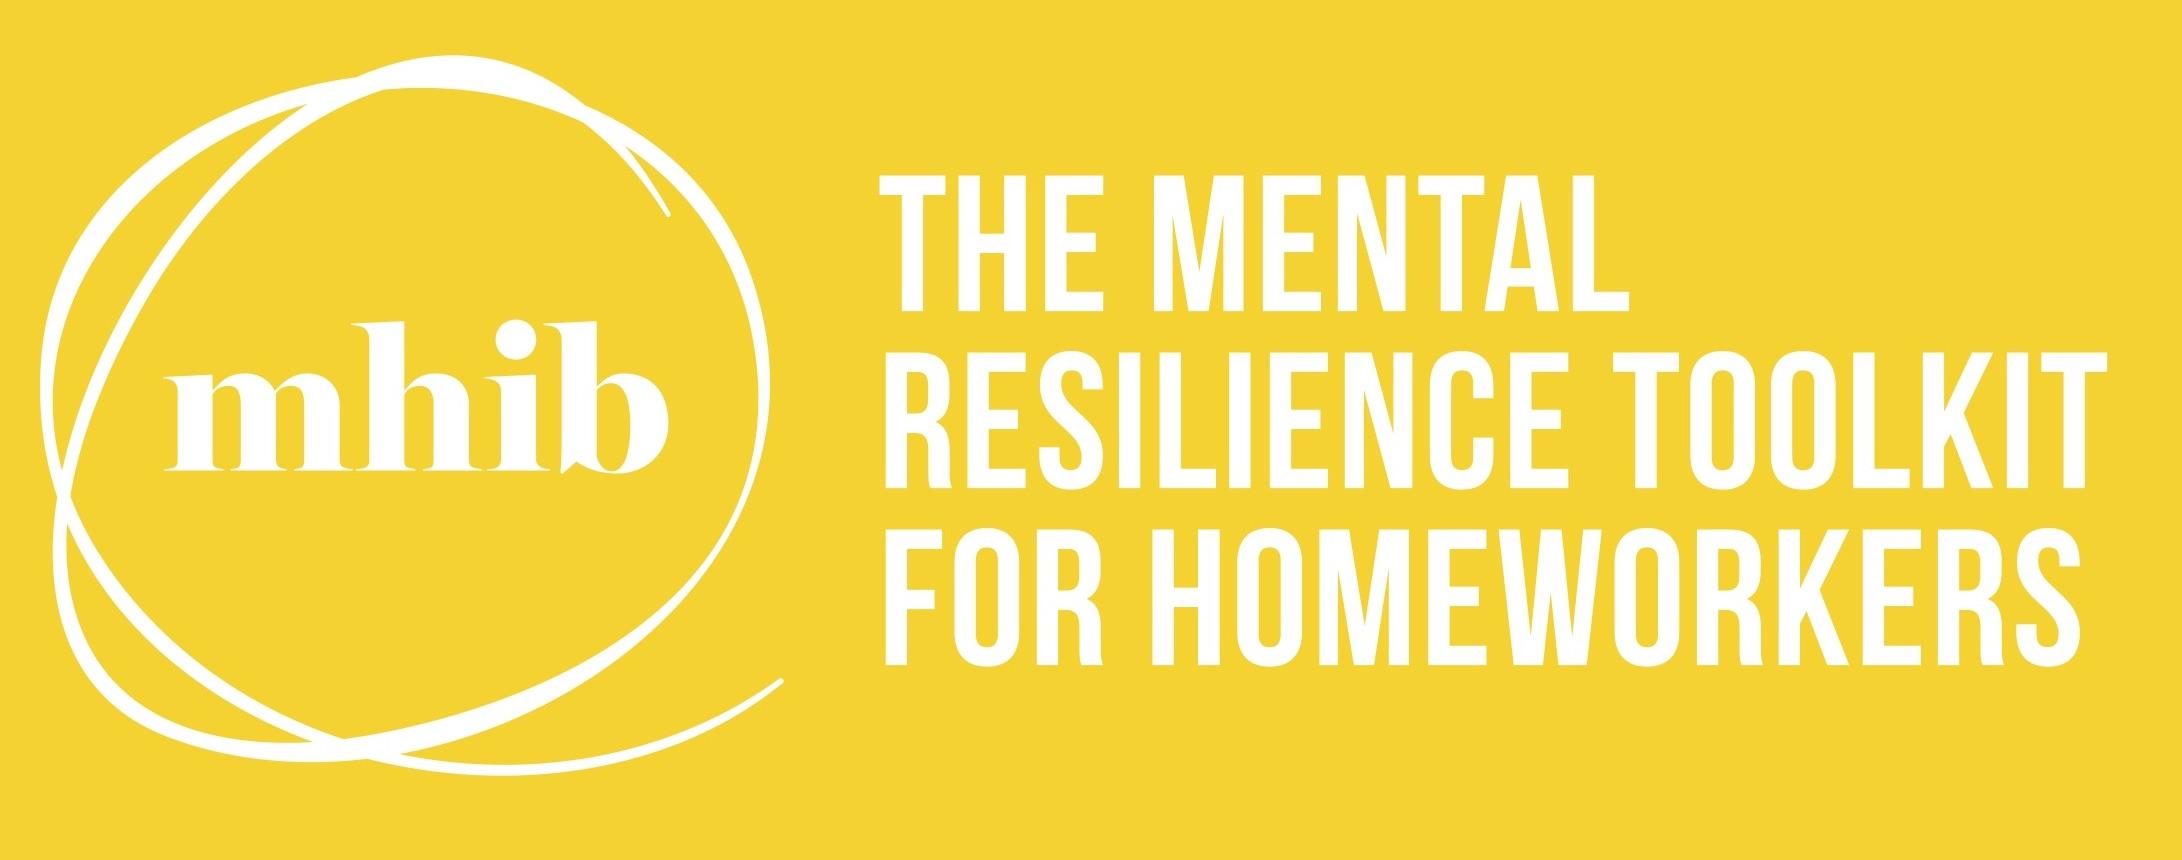 Mental Health in Business Ltd